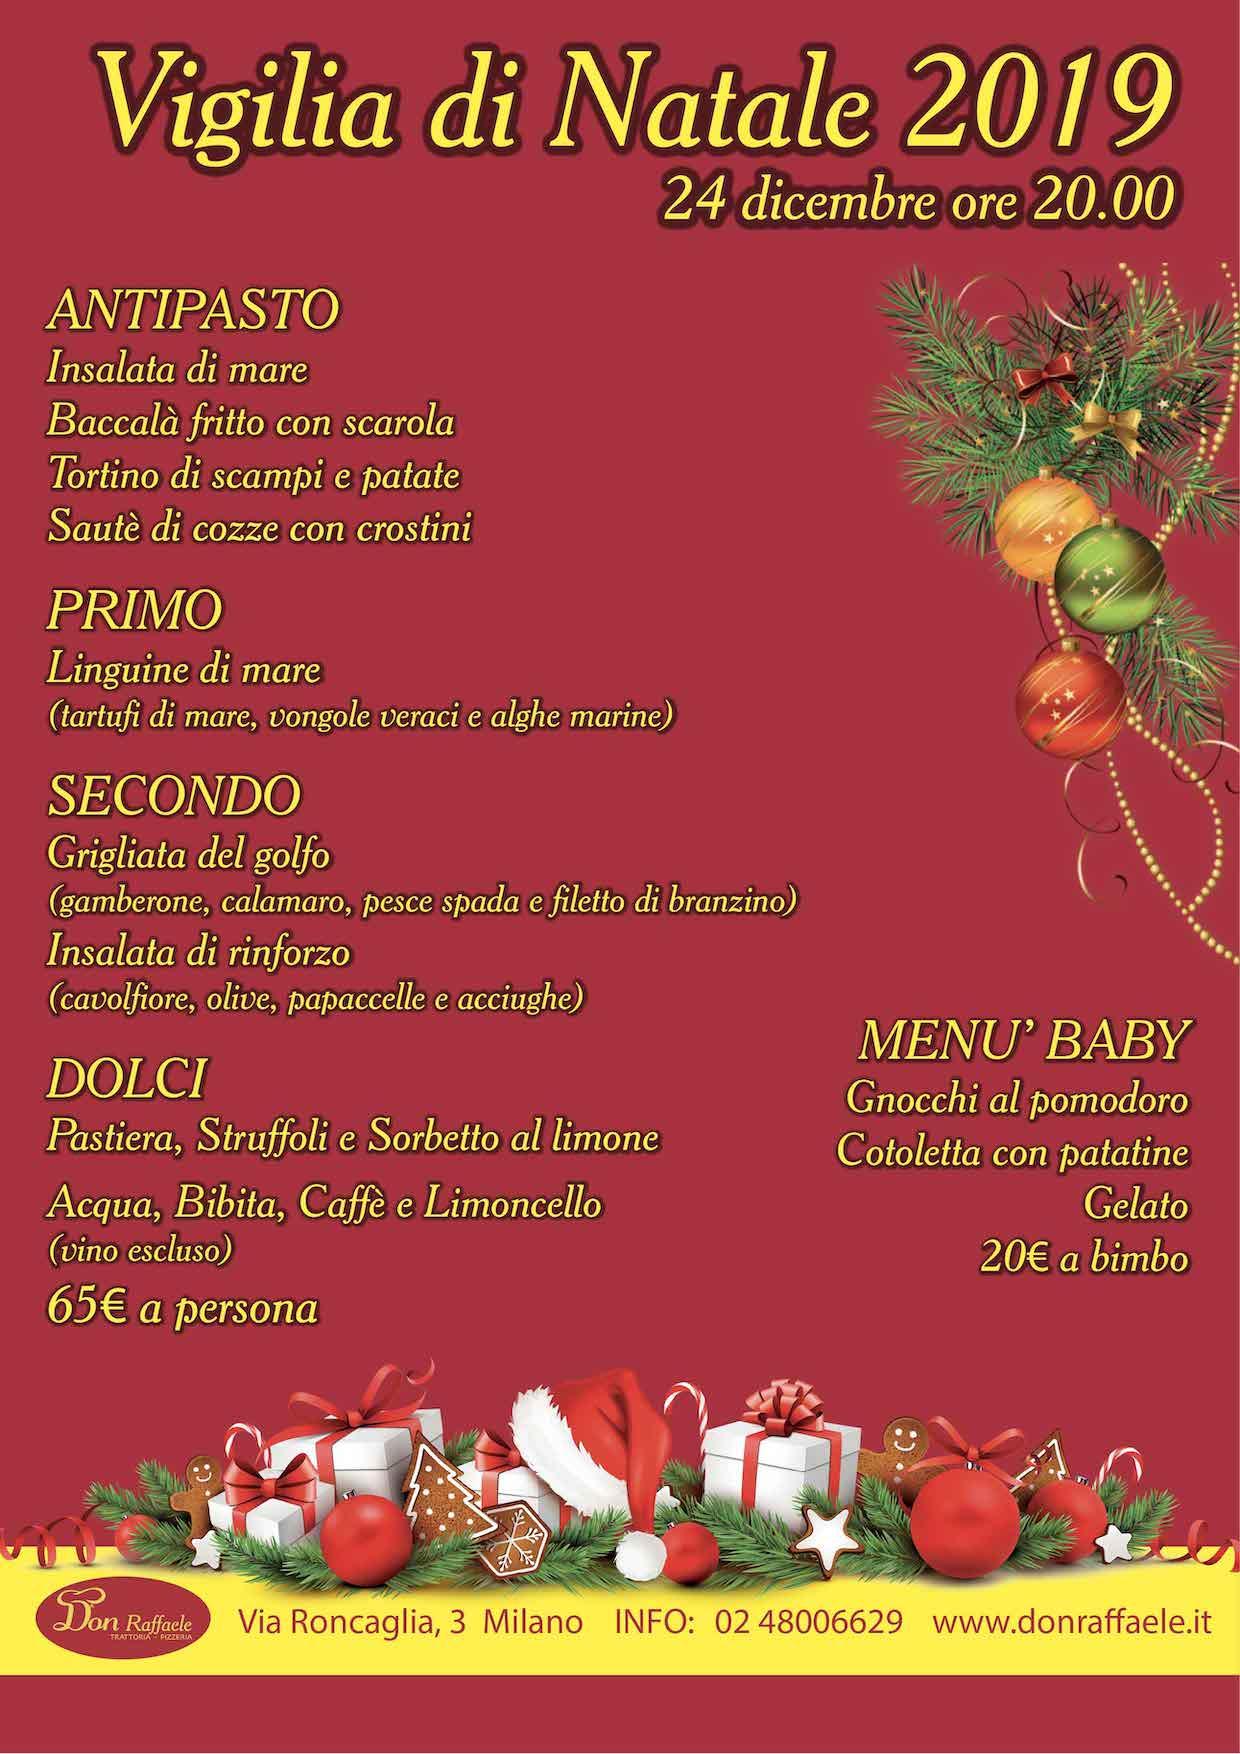 Menu Cenone Vigilia Di Natale.Menu Cena Vigilia Di Natale 2019 Don Raffaele Trattoria Pizzeria A Milano